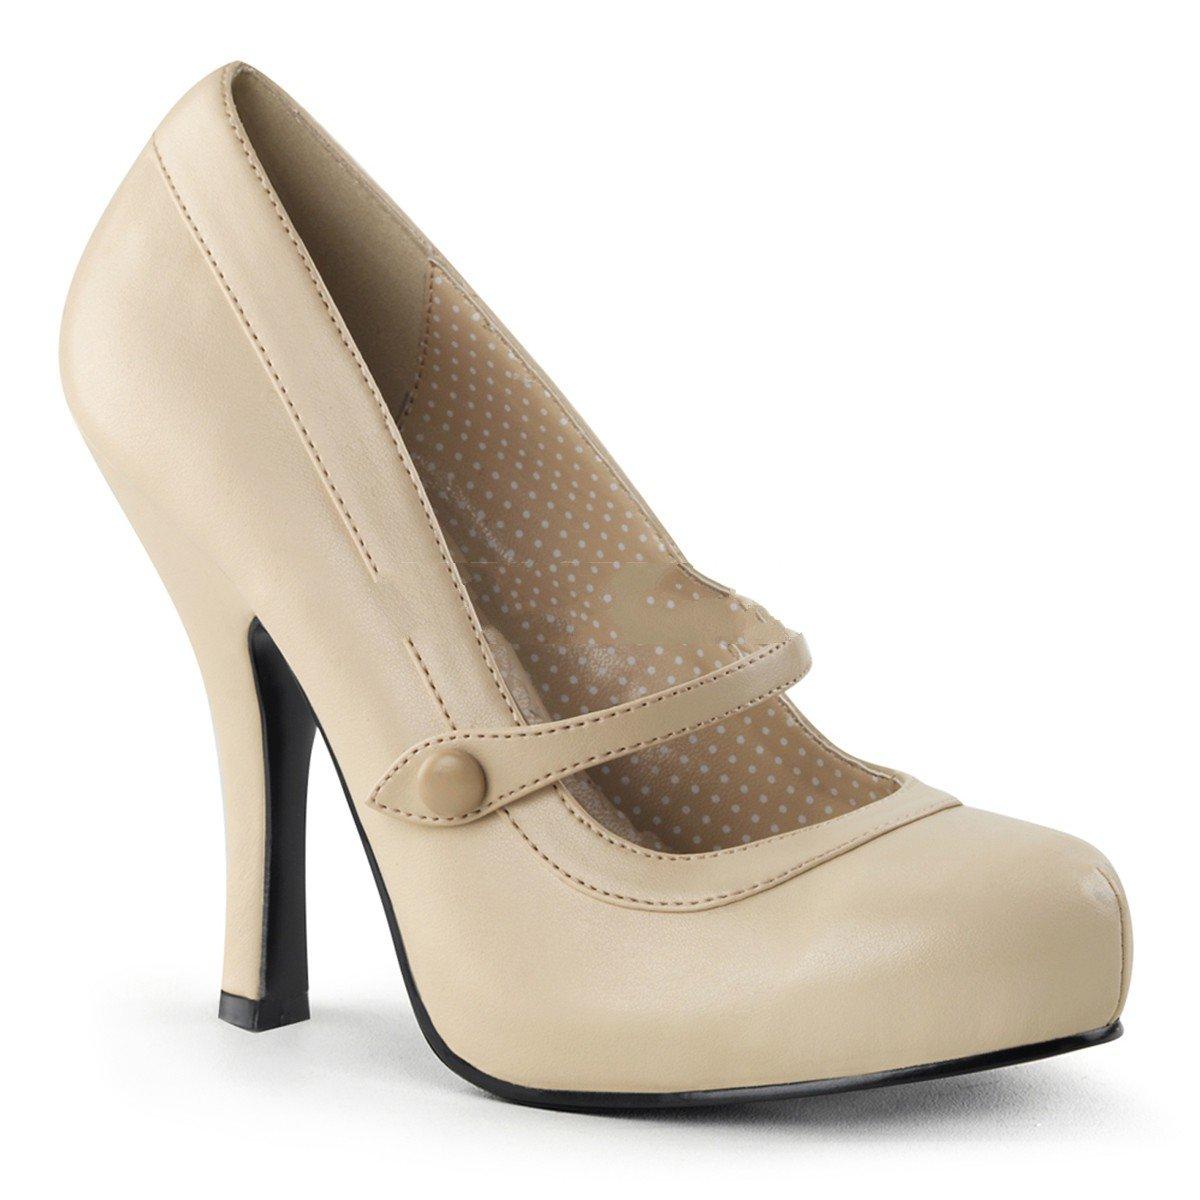 Pinup Couture Cutiepie-02 - Sexy High Heels Retro Mini-Plateau Pumps 35-42, Größe EU-36   US-6   UK-3